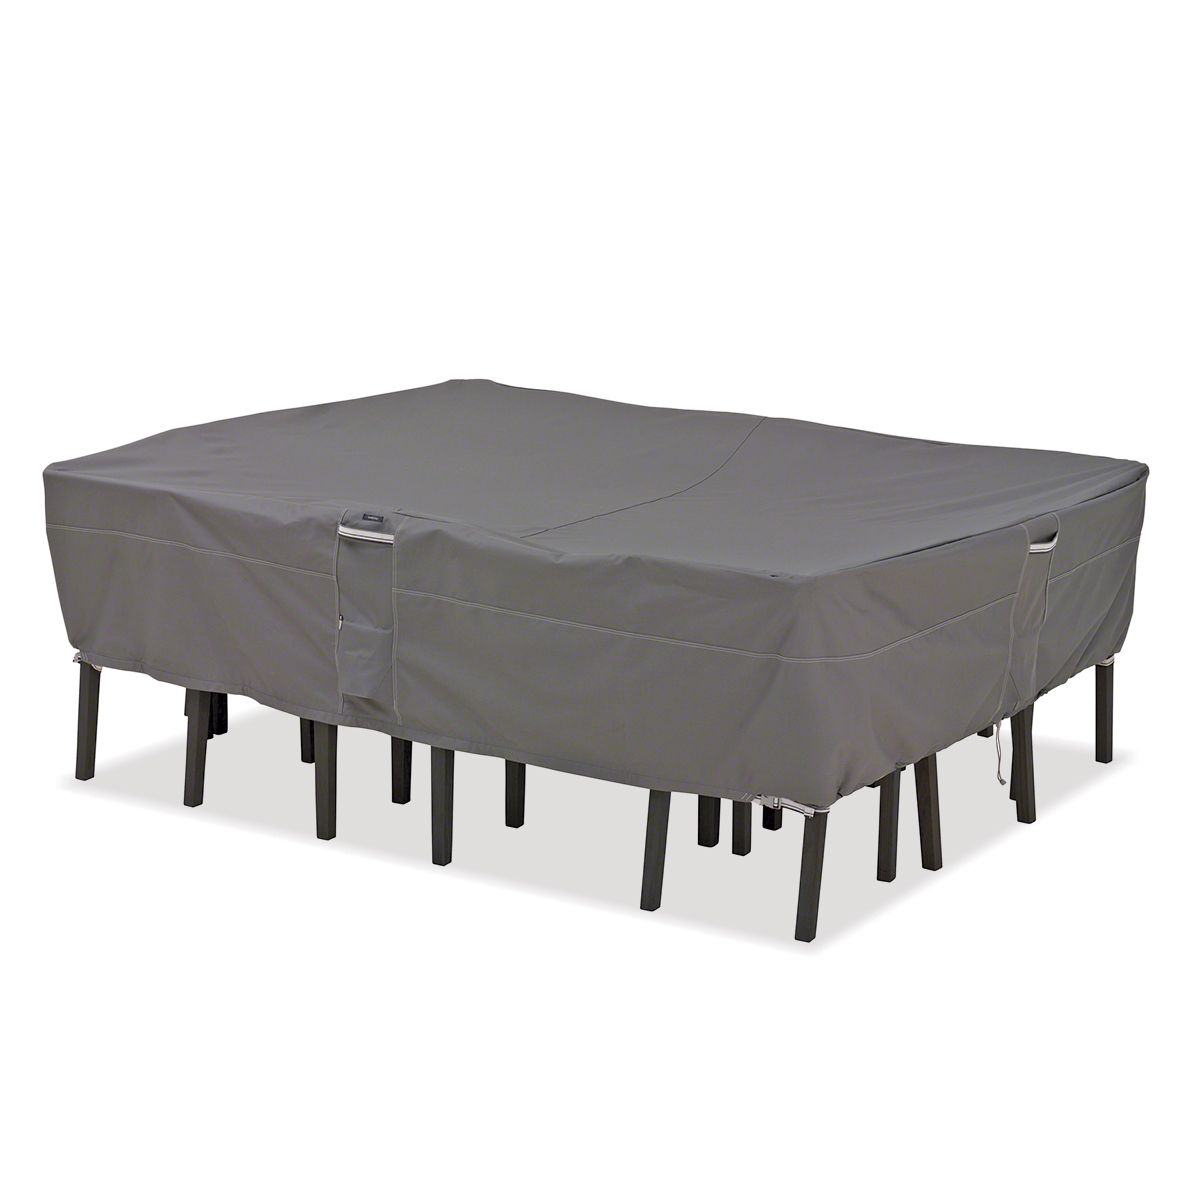 Premium Rectangular Table Set Cover Fits 128w 82d 23h Outdoor